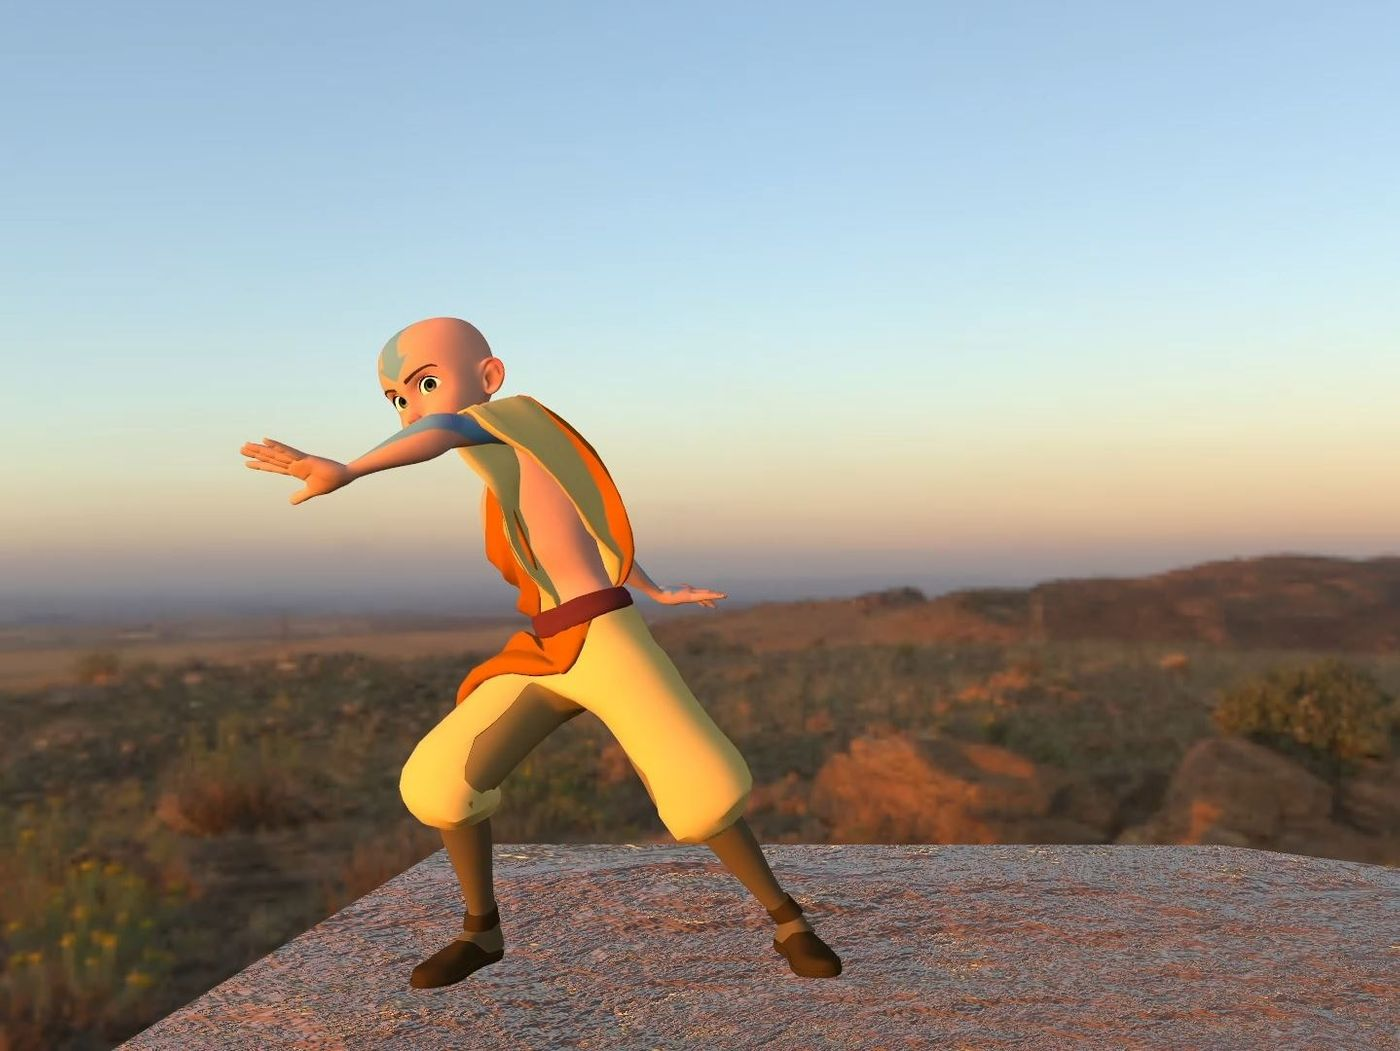 Avatar the Last Air Bender | Body Mechanics